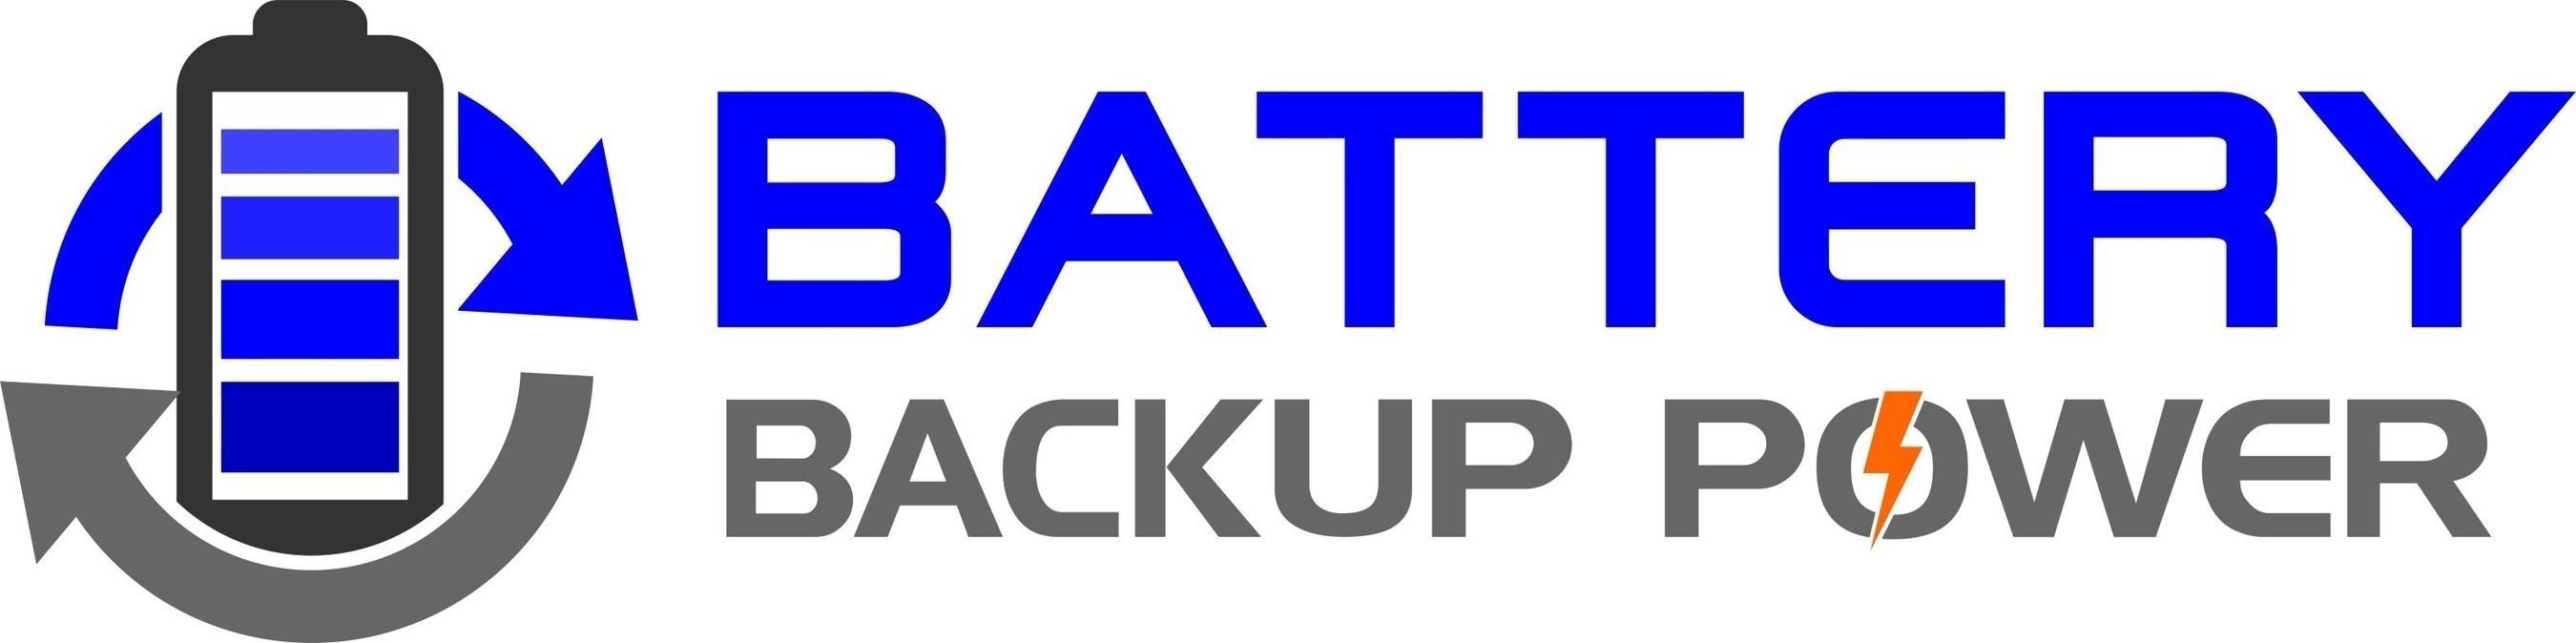 Battery Backup Power, Inc. logo